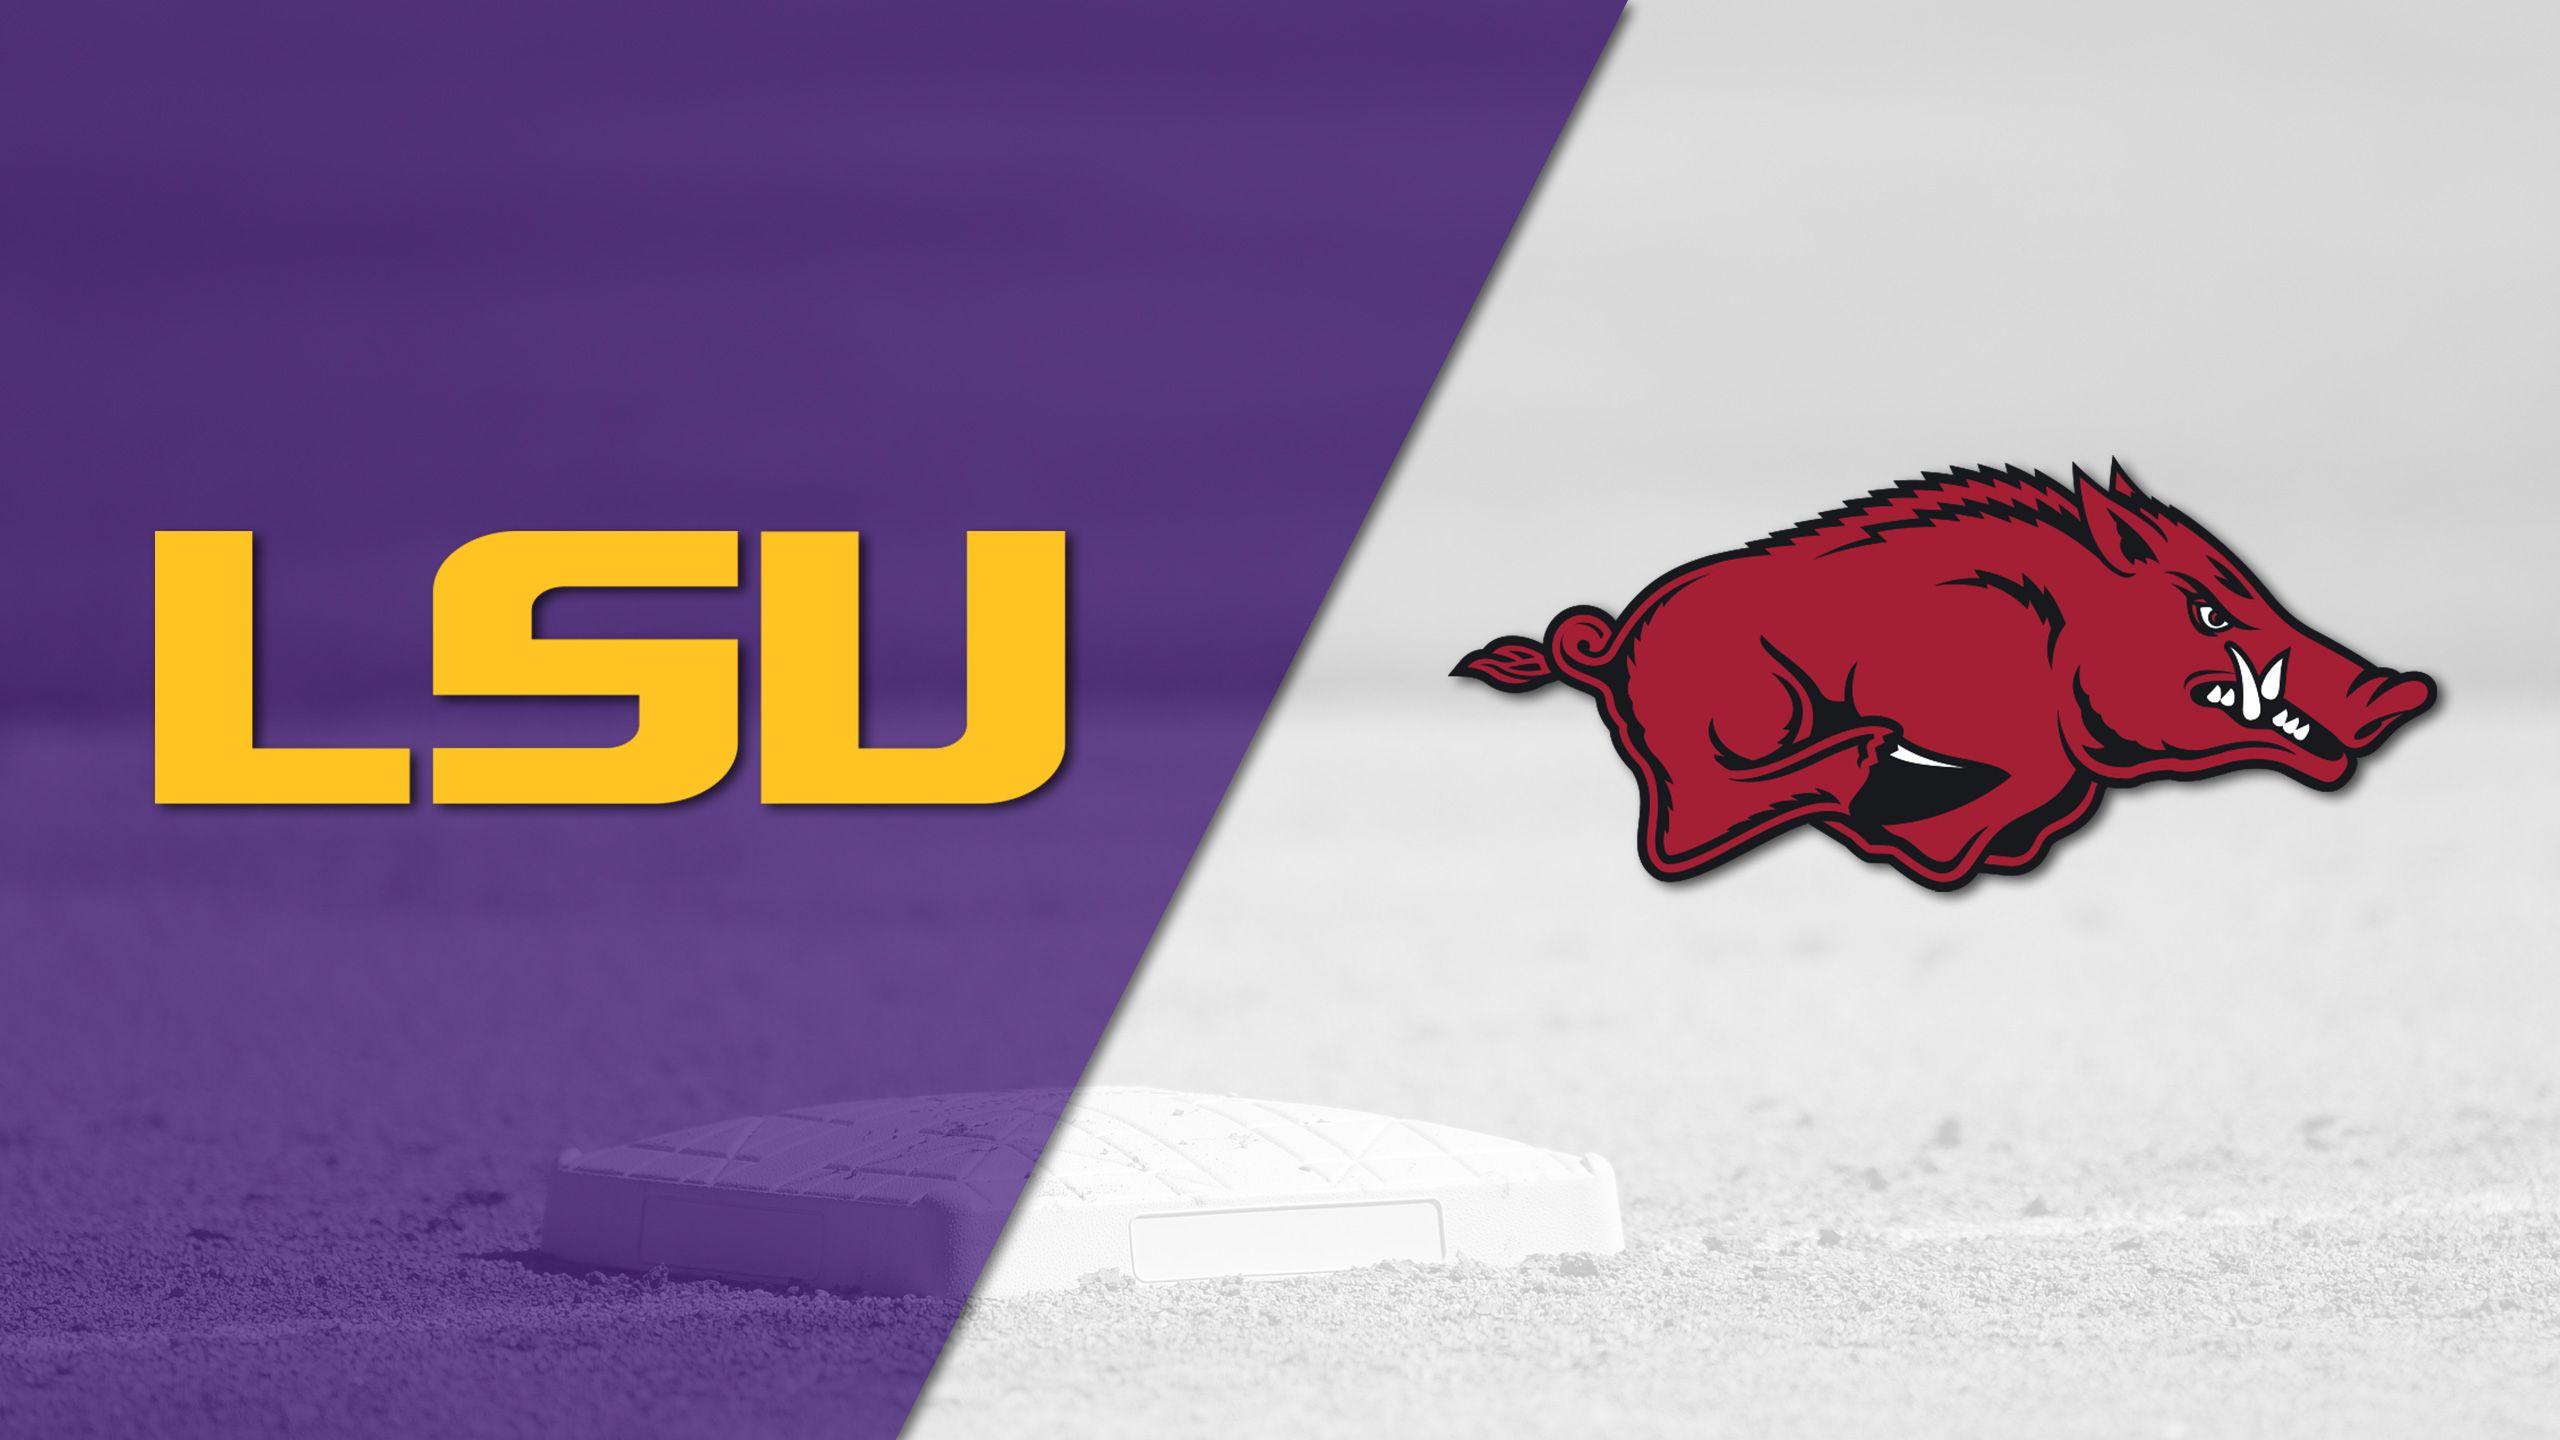 #13 LSU vs. #15 Arkansas (Baseball)